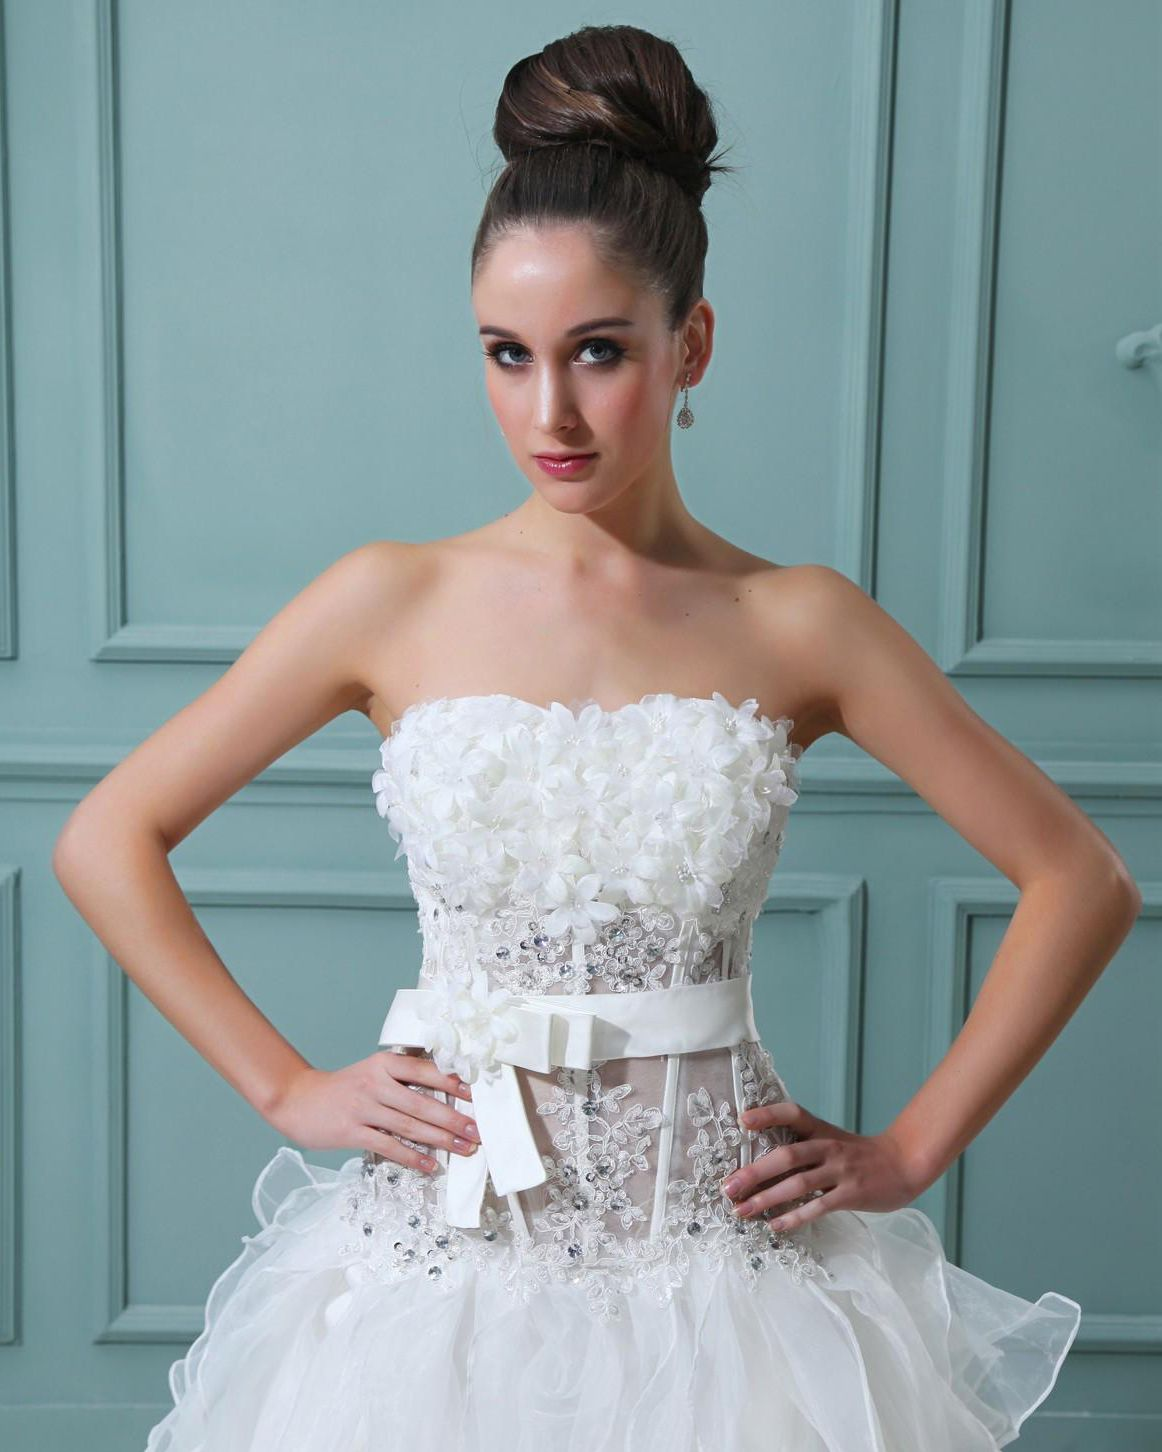 Ruffle+Strapless+Short+Bridal+Gown+Wedding+Dress++A-line%5c ...